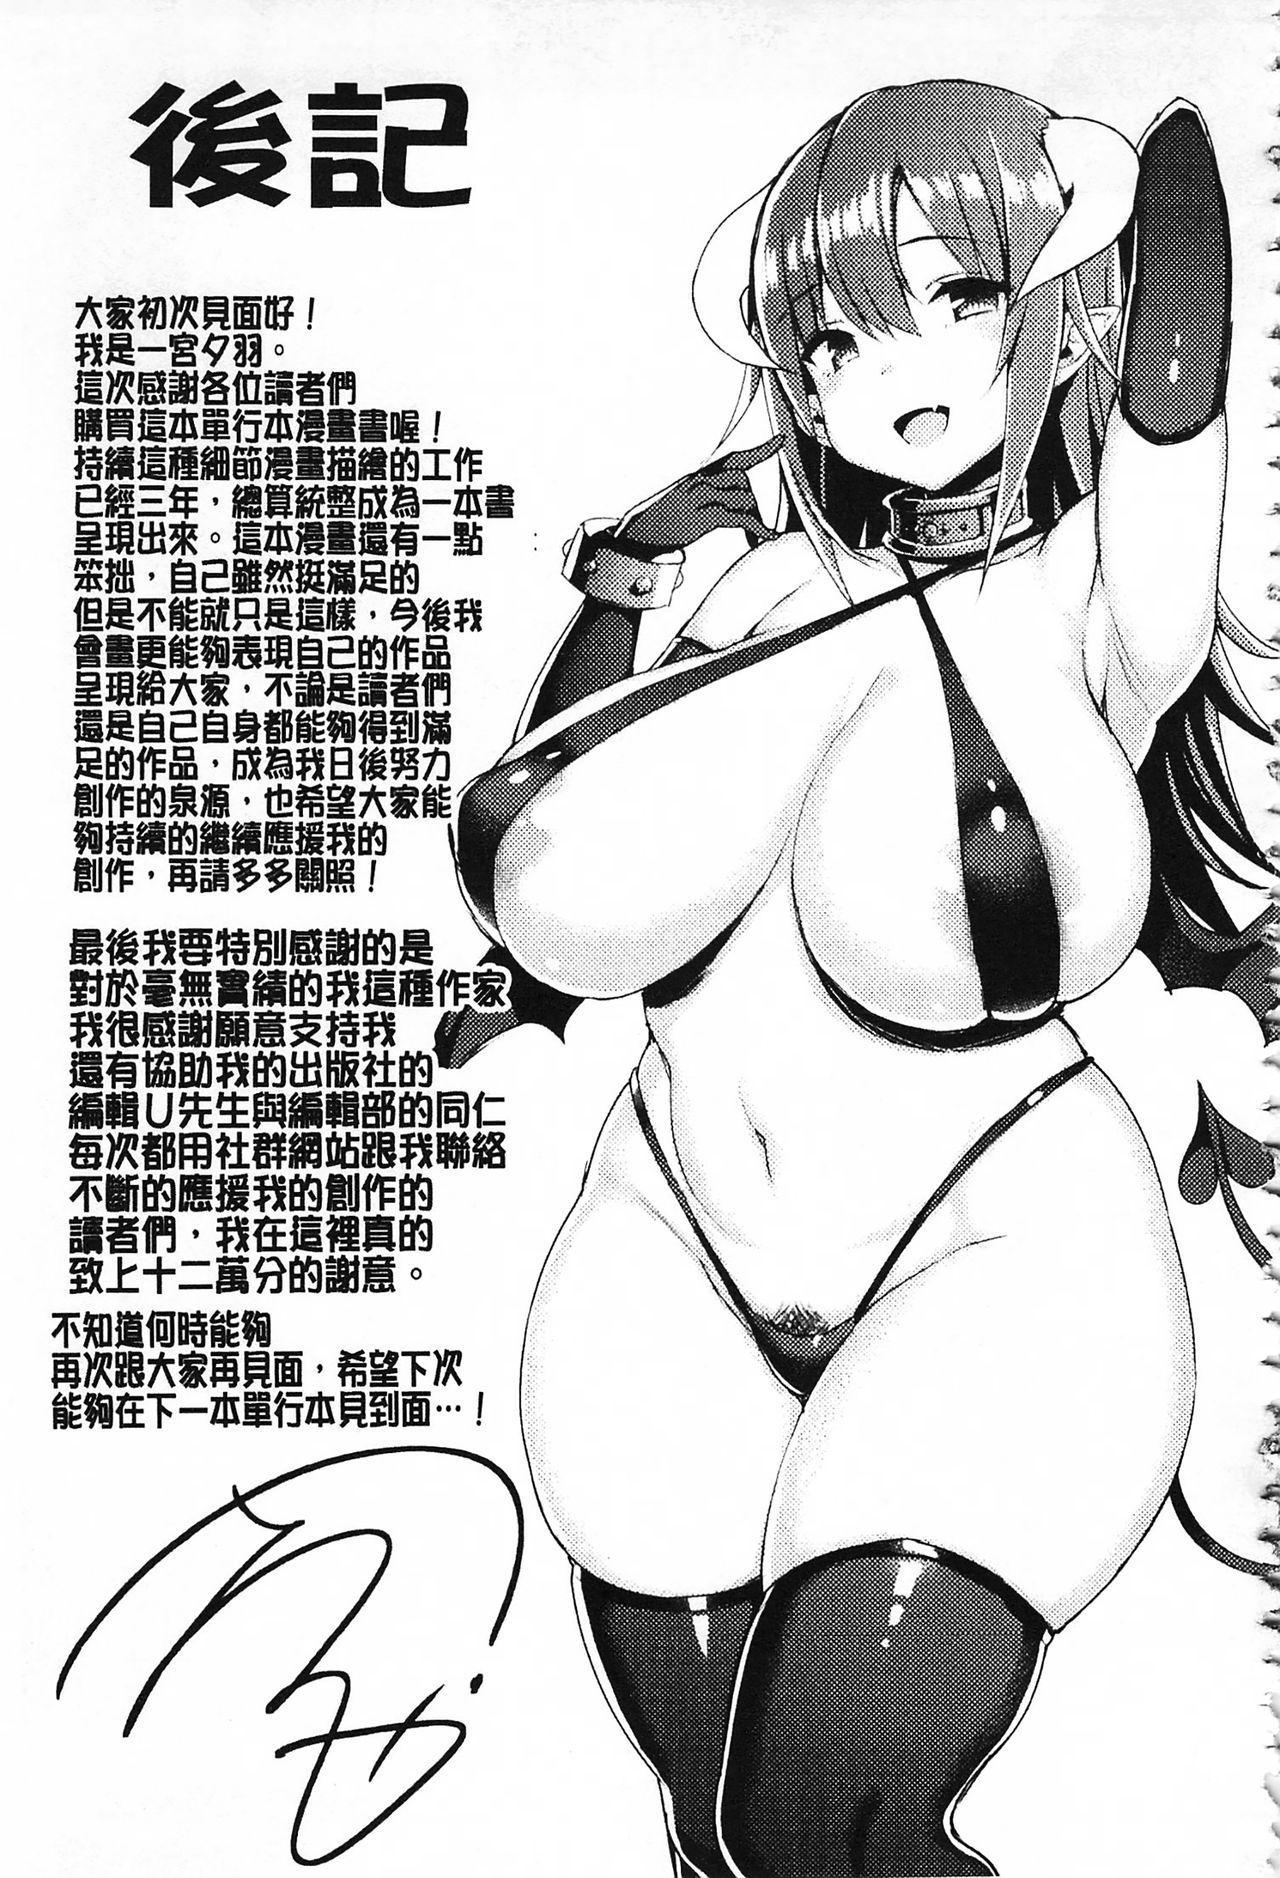 [Ichinomiya Yuu] Hatsujou Switch ~ Otosareta Shoujo-tachi ~   發情啟動開關~墮落下去的少女們~ [Chinese] 188